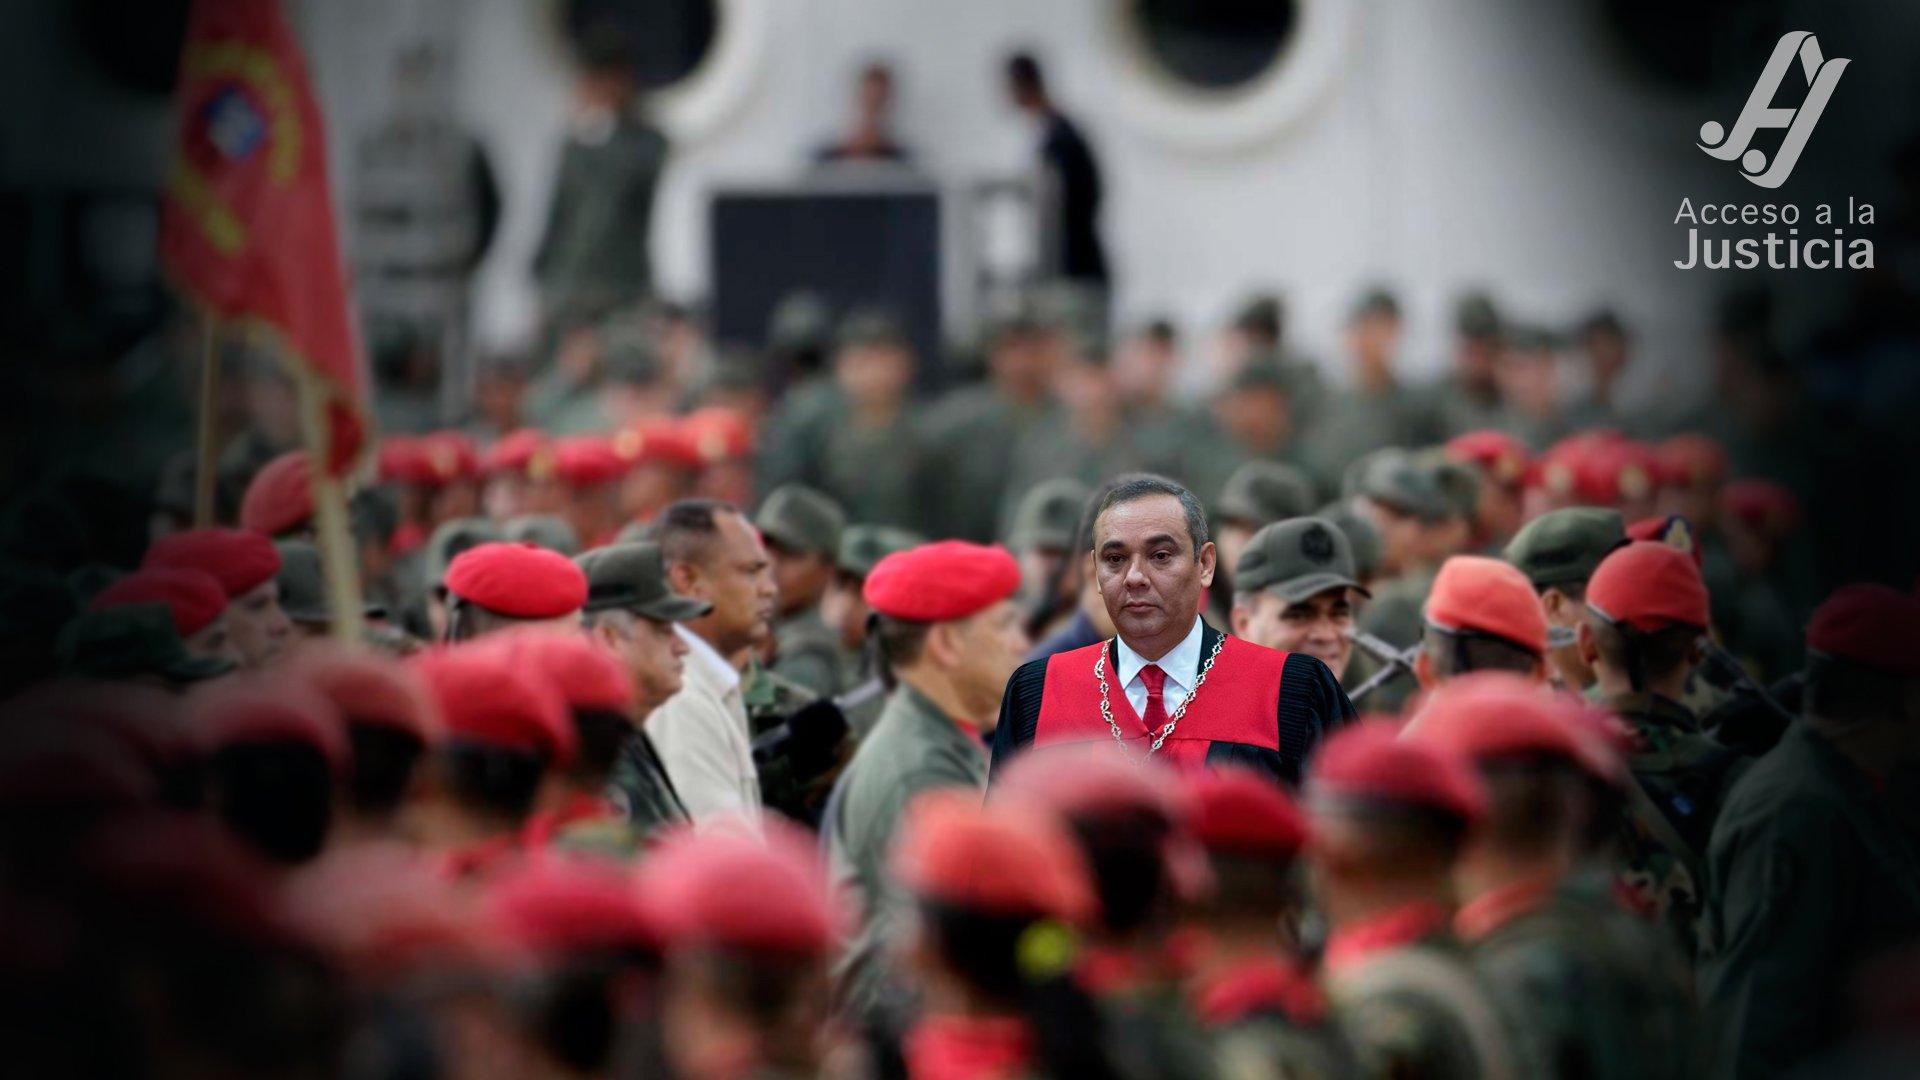 Jurisprudencia del TSJ privilegia a militares sobre los civiles